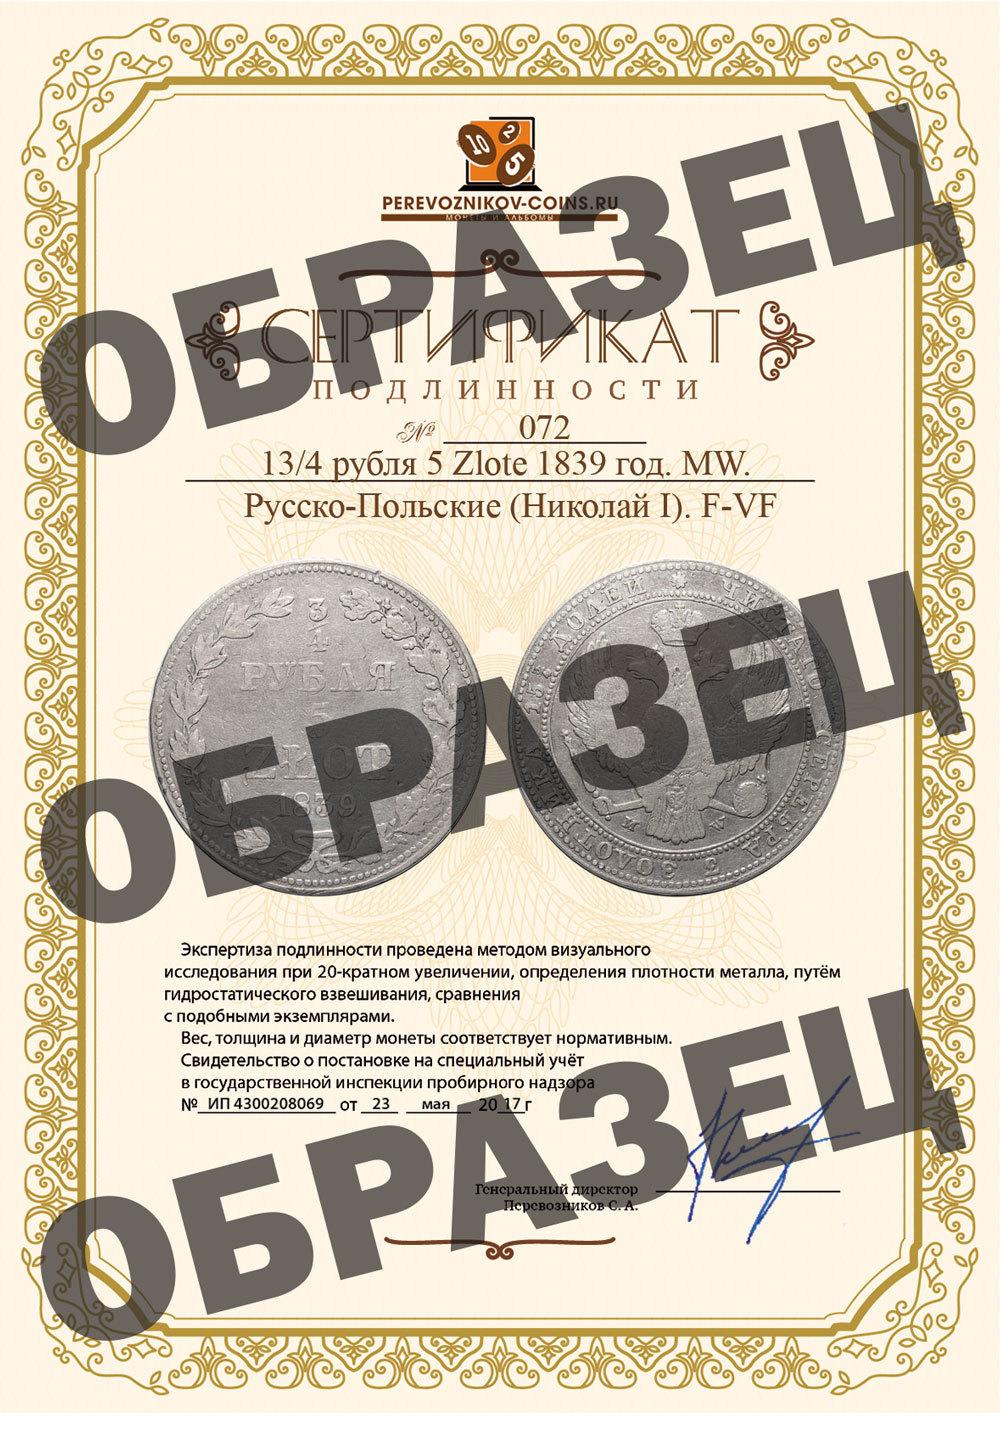 3/4 рубля 5 Zlote 1839 год. MW. Русско-Польские (Николай I). F-VF